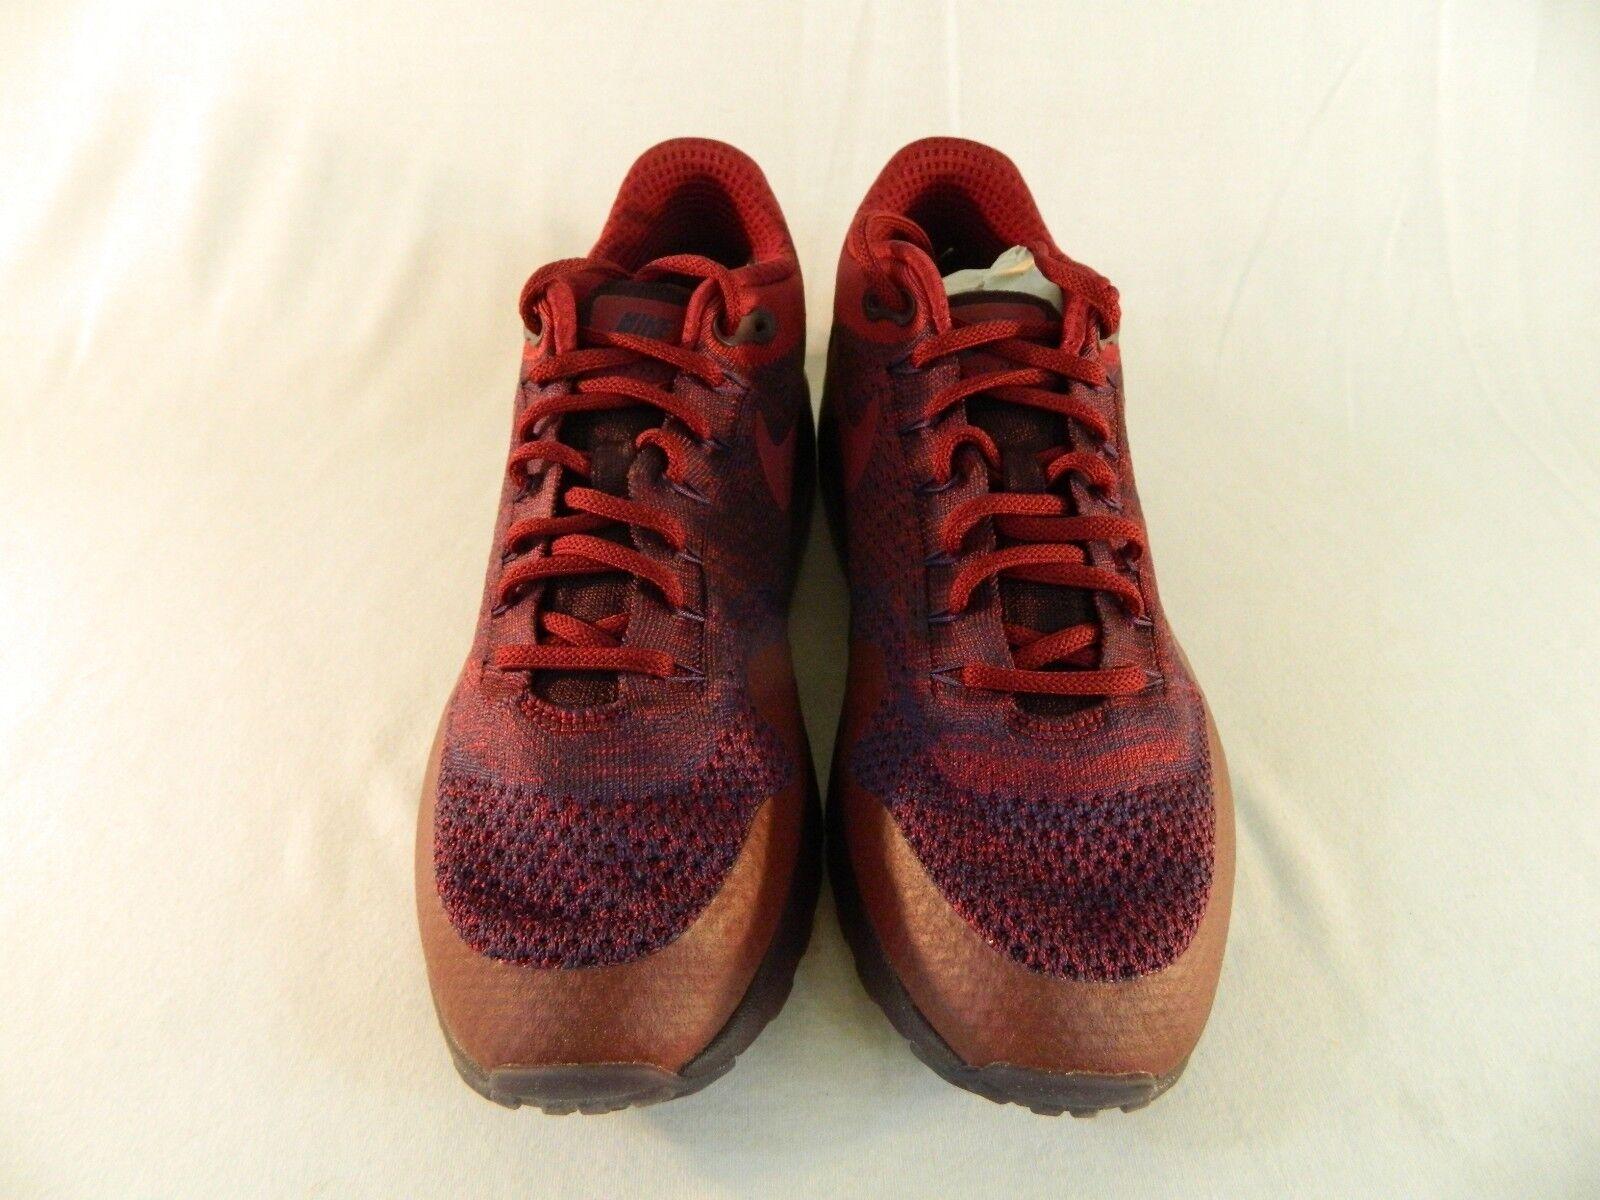 Nike Air Max 1 Ultra Flyknit Grand Grand Grand Purple Team Red  Men's 11.5 (856958 566) 30e672